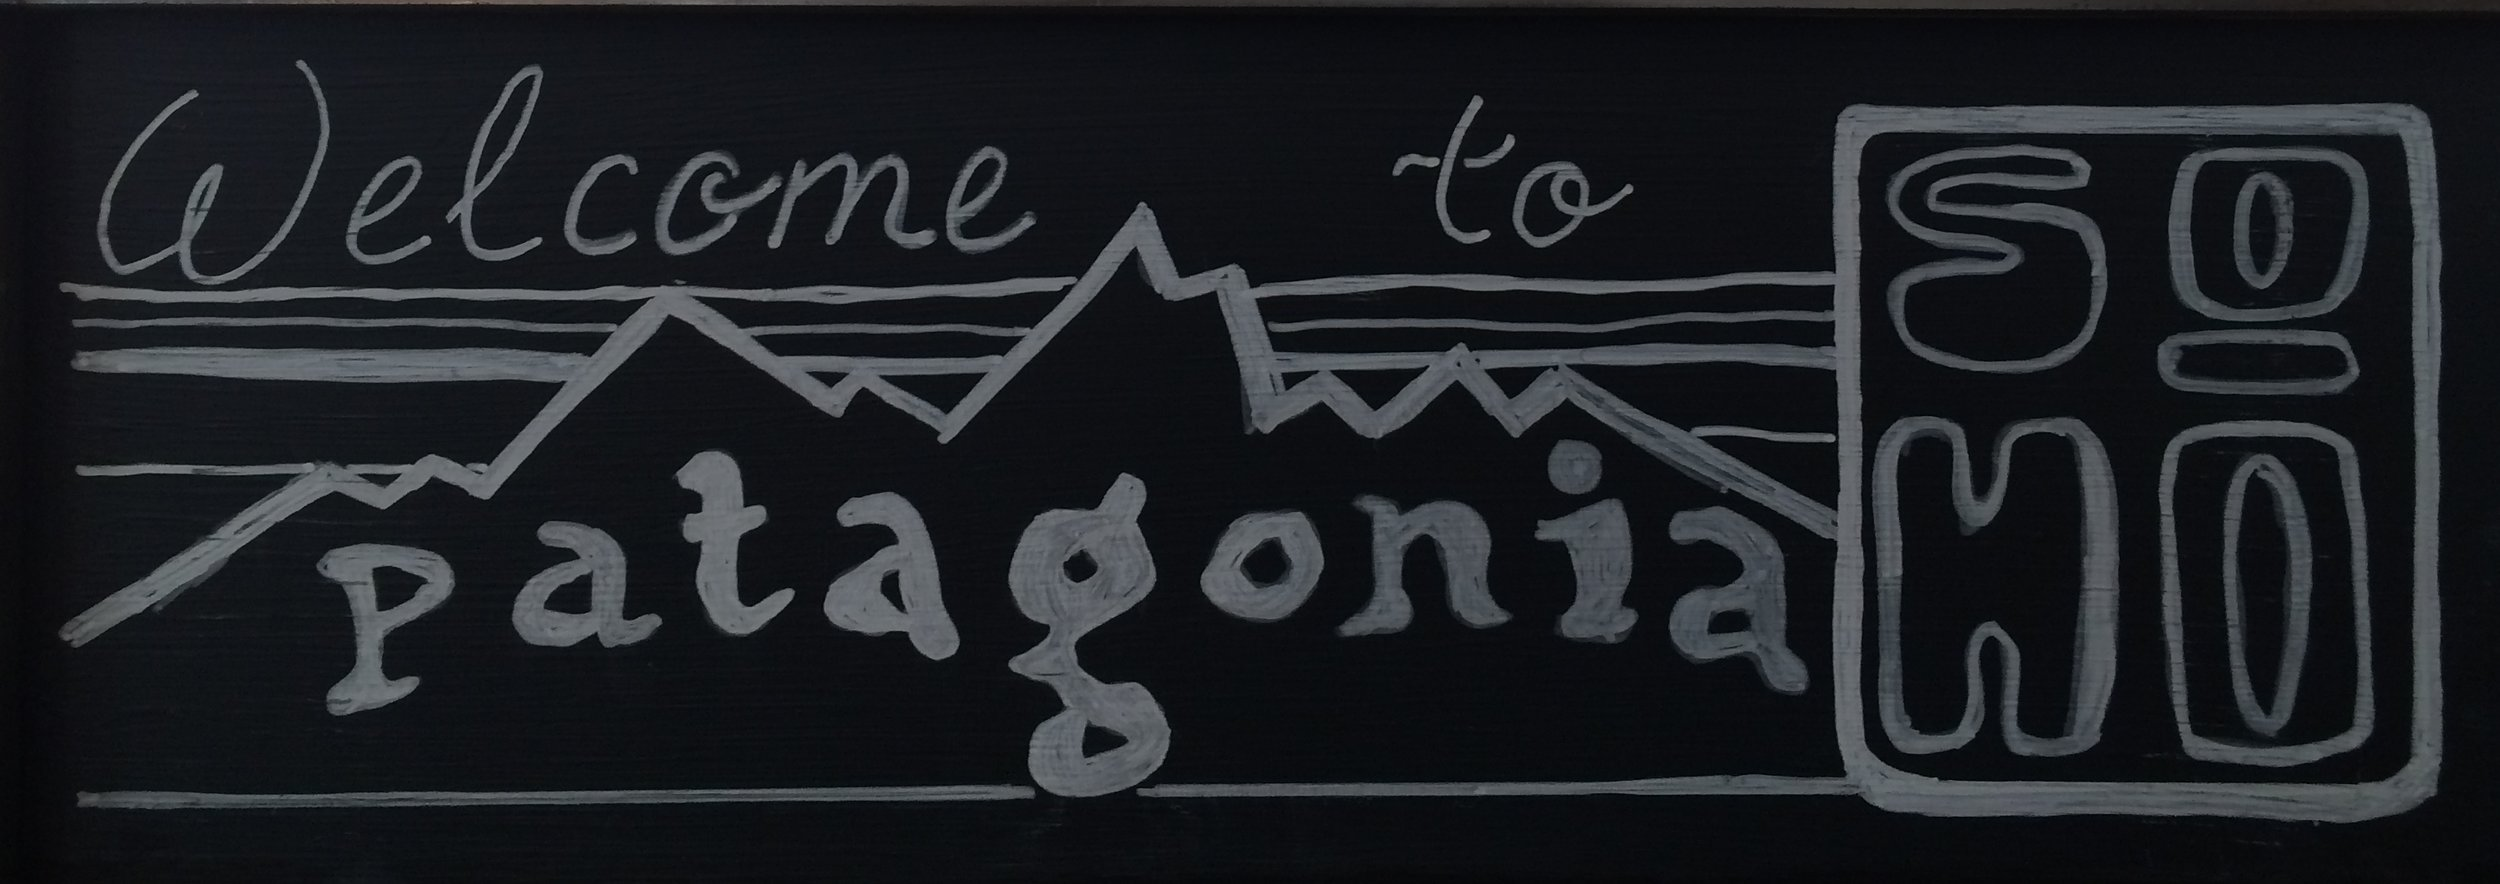 patagonia-soho.jpg